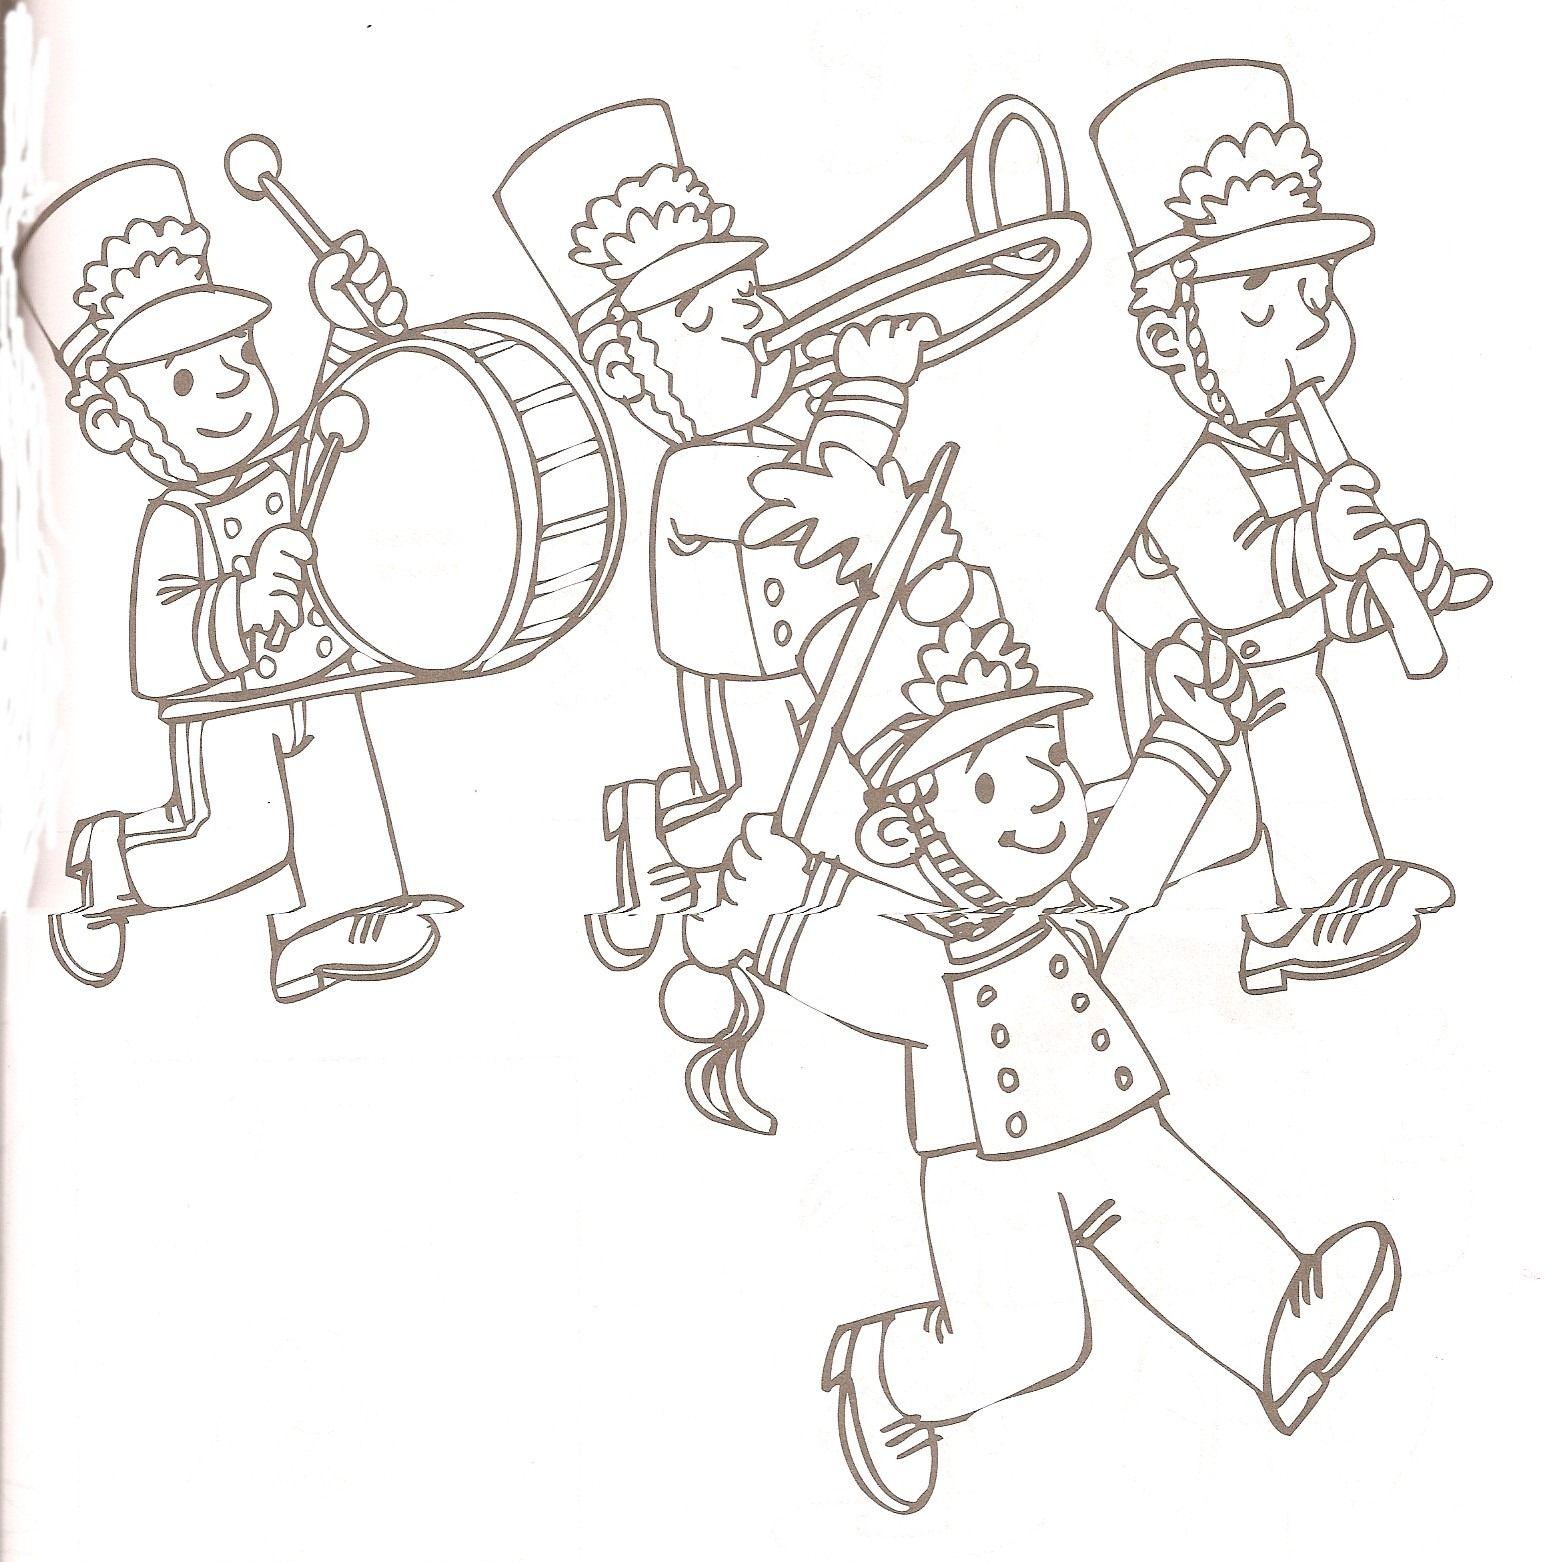 Banda De Musica 2 Jpg Image Dibujos Paginas Para Colorear Te Falle